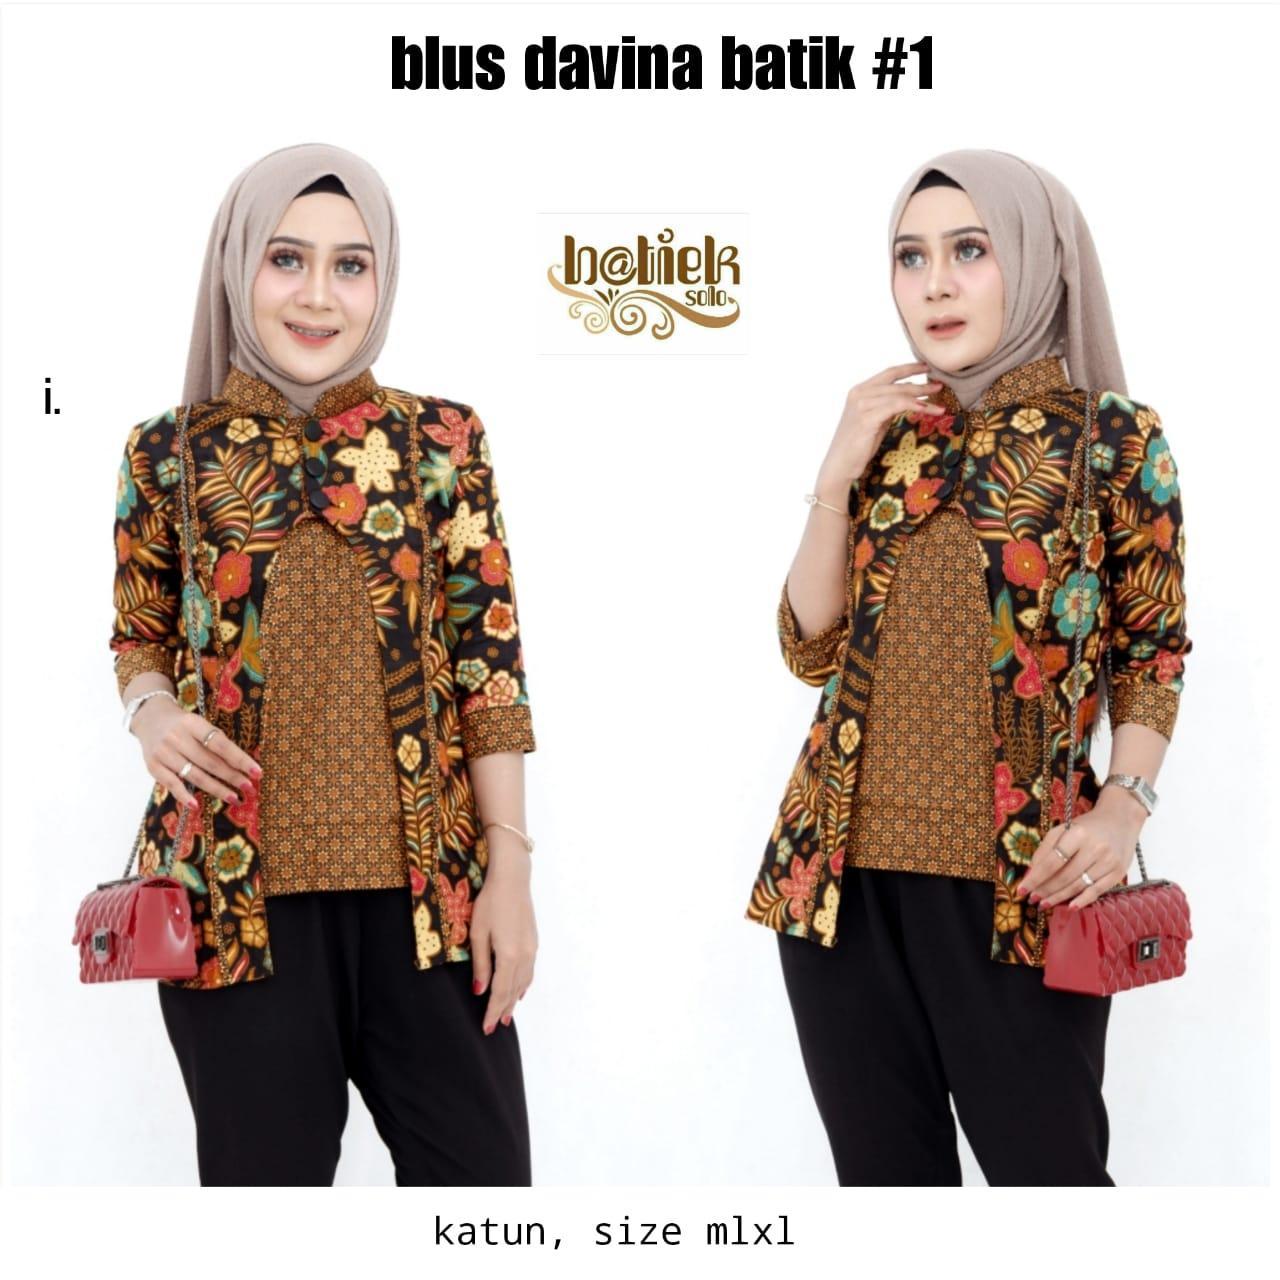 Blus Davina Batik 1 Katun Model Baju Batik Kantor Wanita Berjilbab Cardigan Batik Model Batik Wanita 2019 Model Baju Batik Wanita 2019 Model Baju Tunik Batik Baju Tunik Batik Model Baju Batik